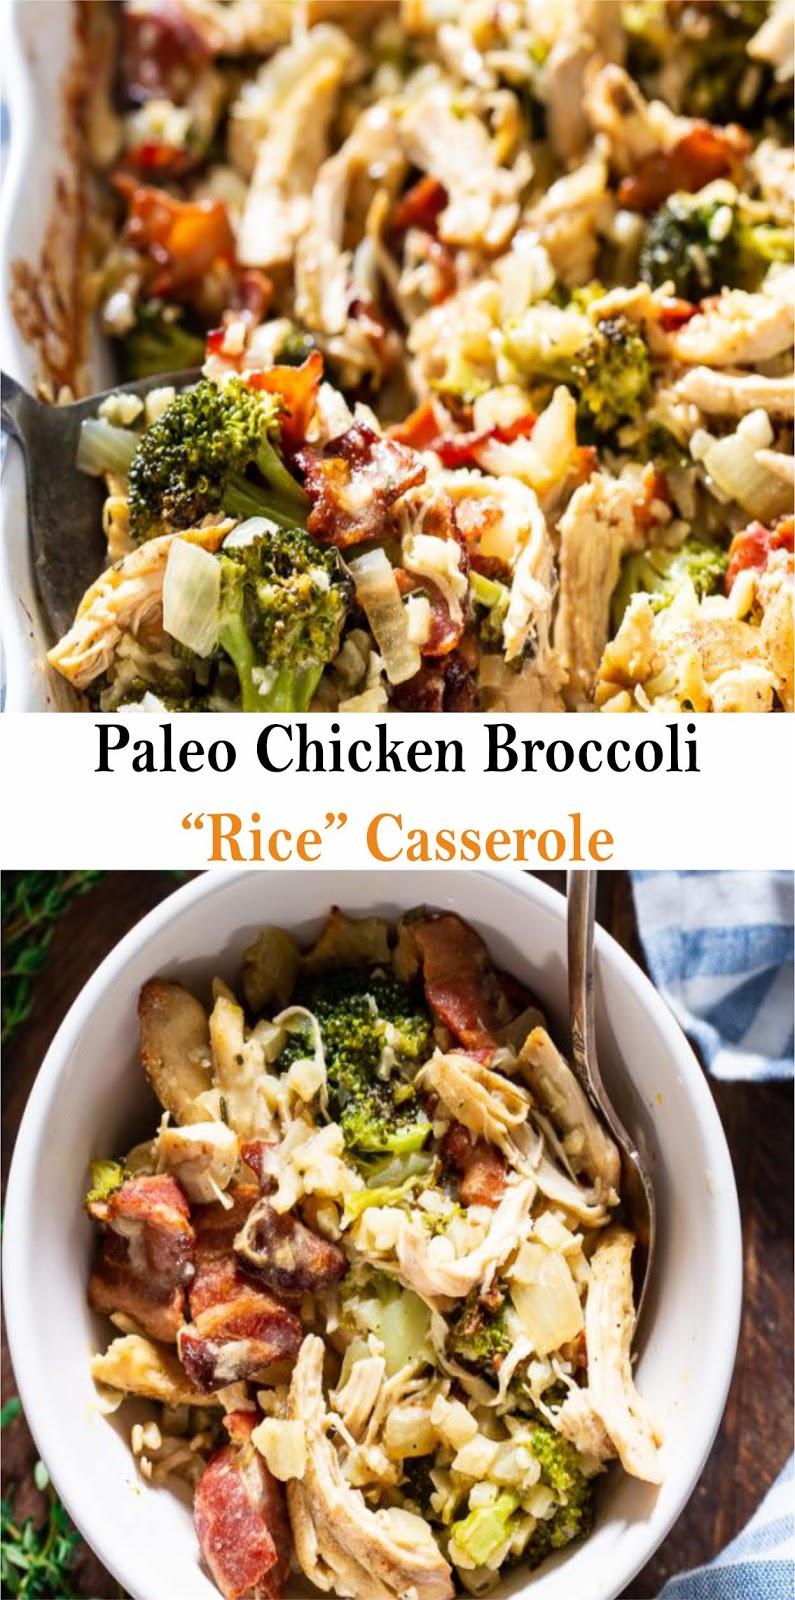 Paleo Chicken Broccoli Rice Casserole - Best Recipes -9966